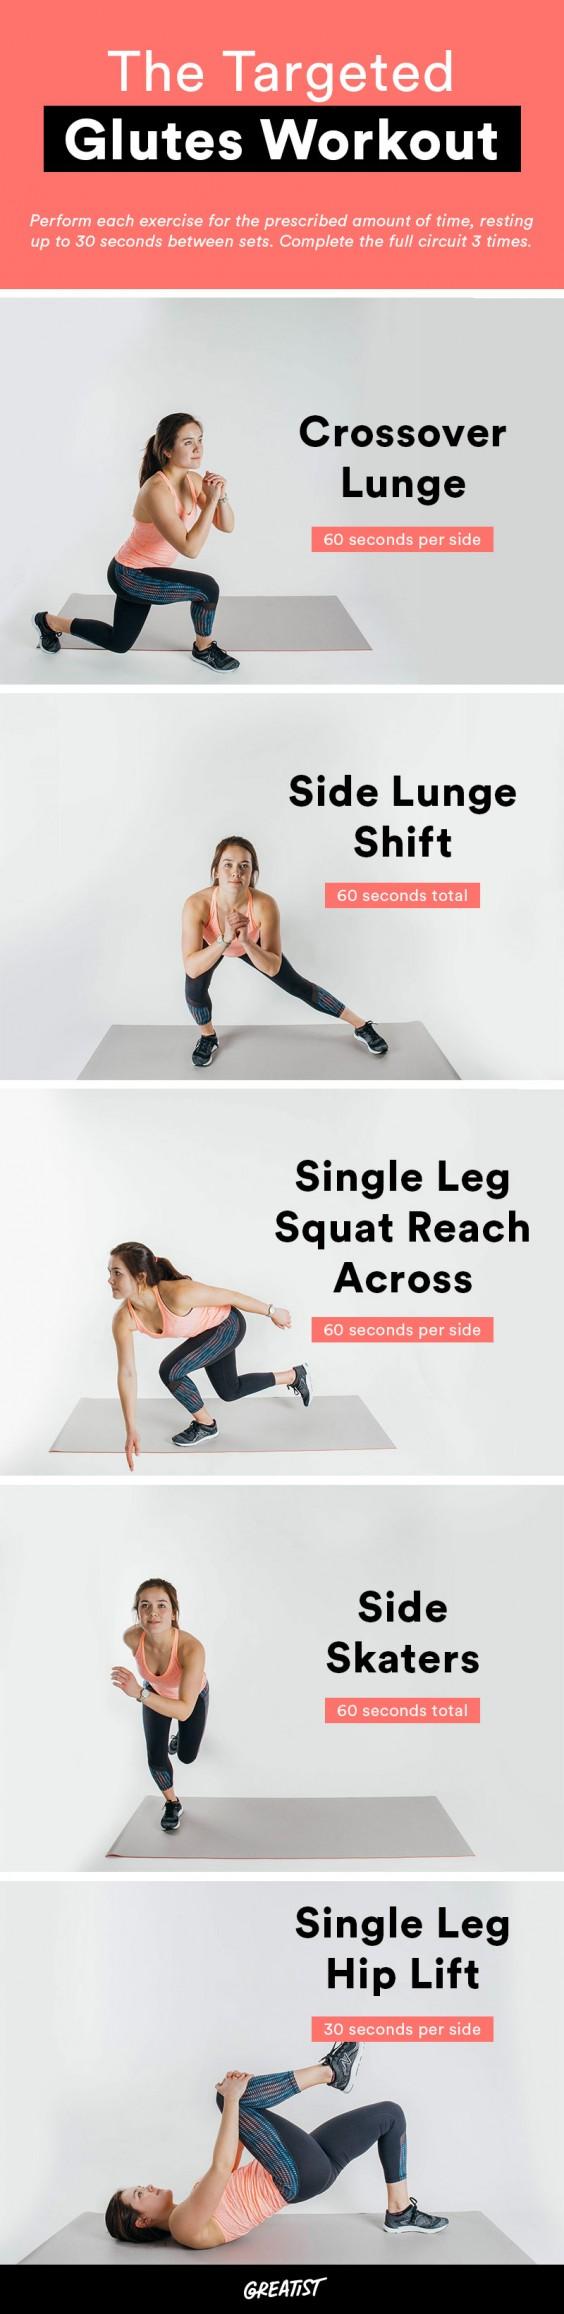 best butt exercises: workout